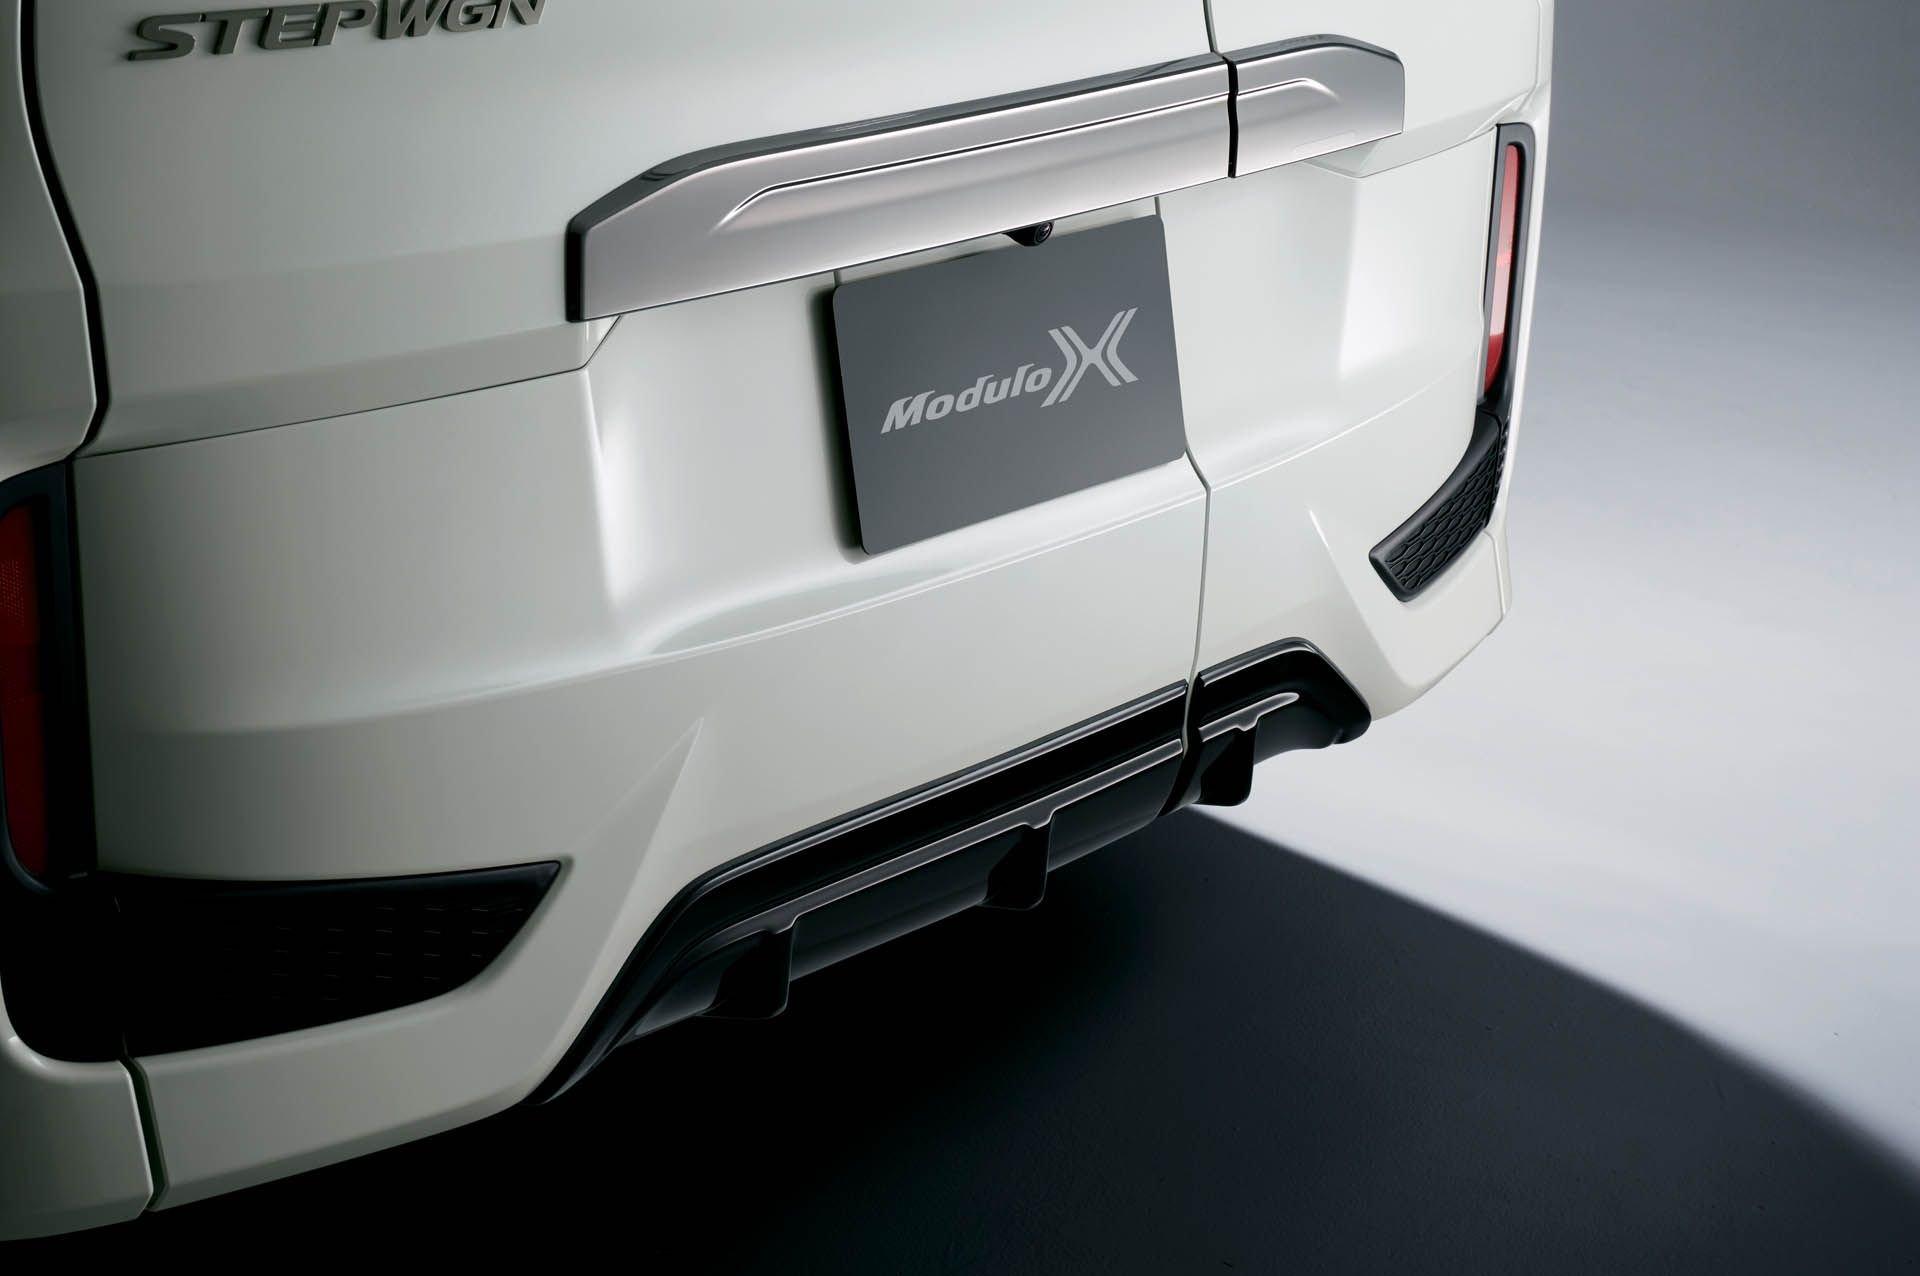 Honda_ Step_WGN_Modulo_X_0002